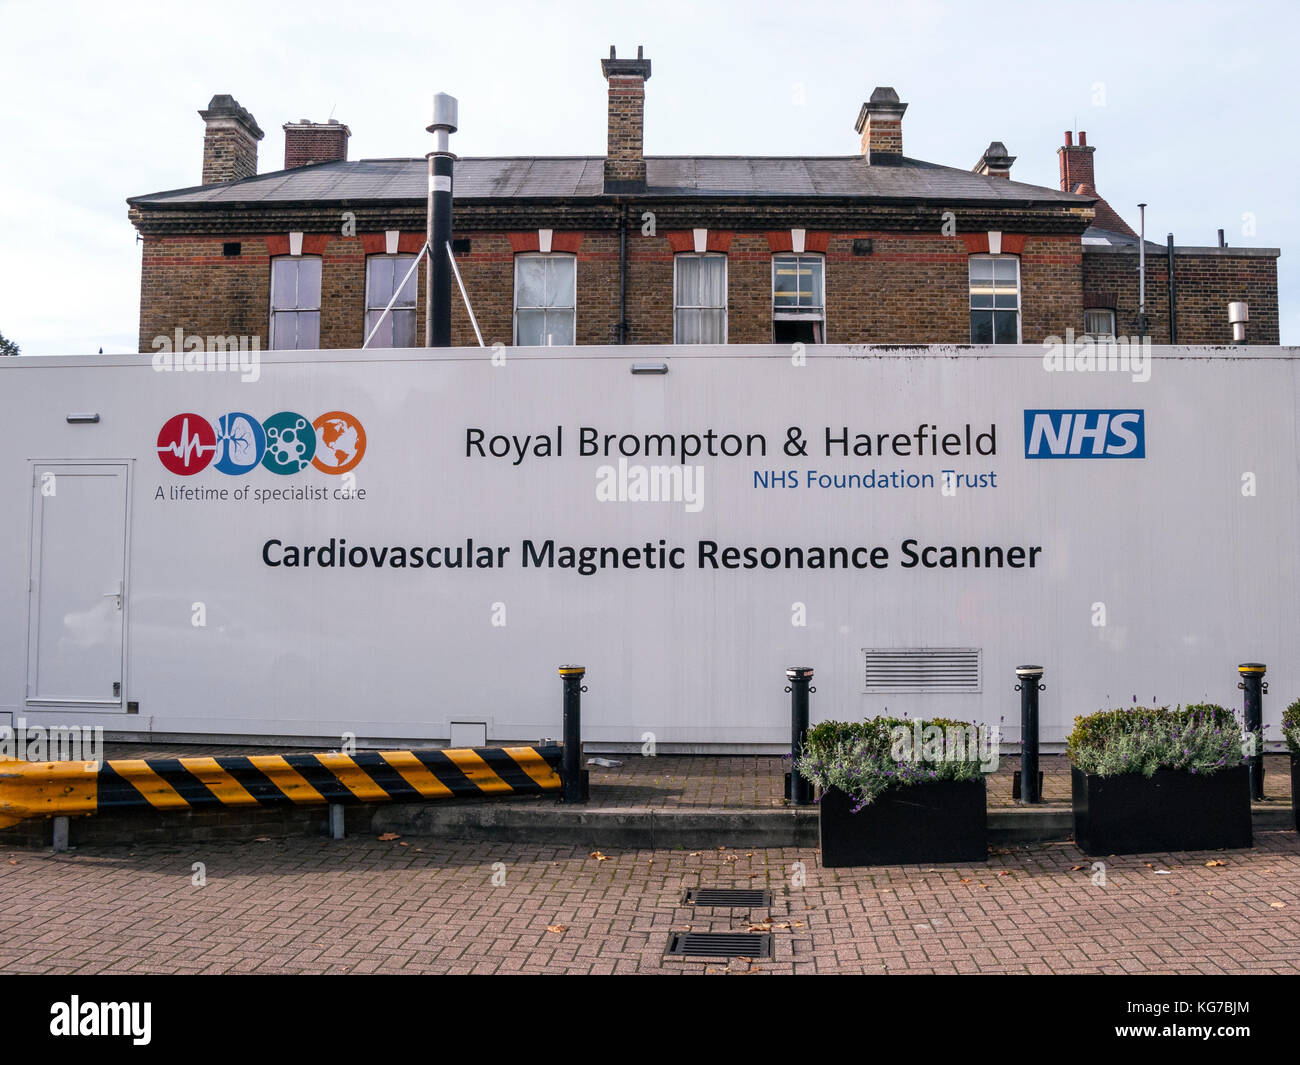 Cardiovascular Magnetic Resonance Scanner, Royal Brompton Hospital, Chelsea, London - Stock Image